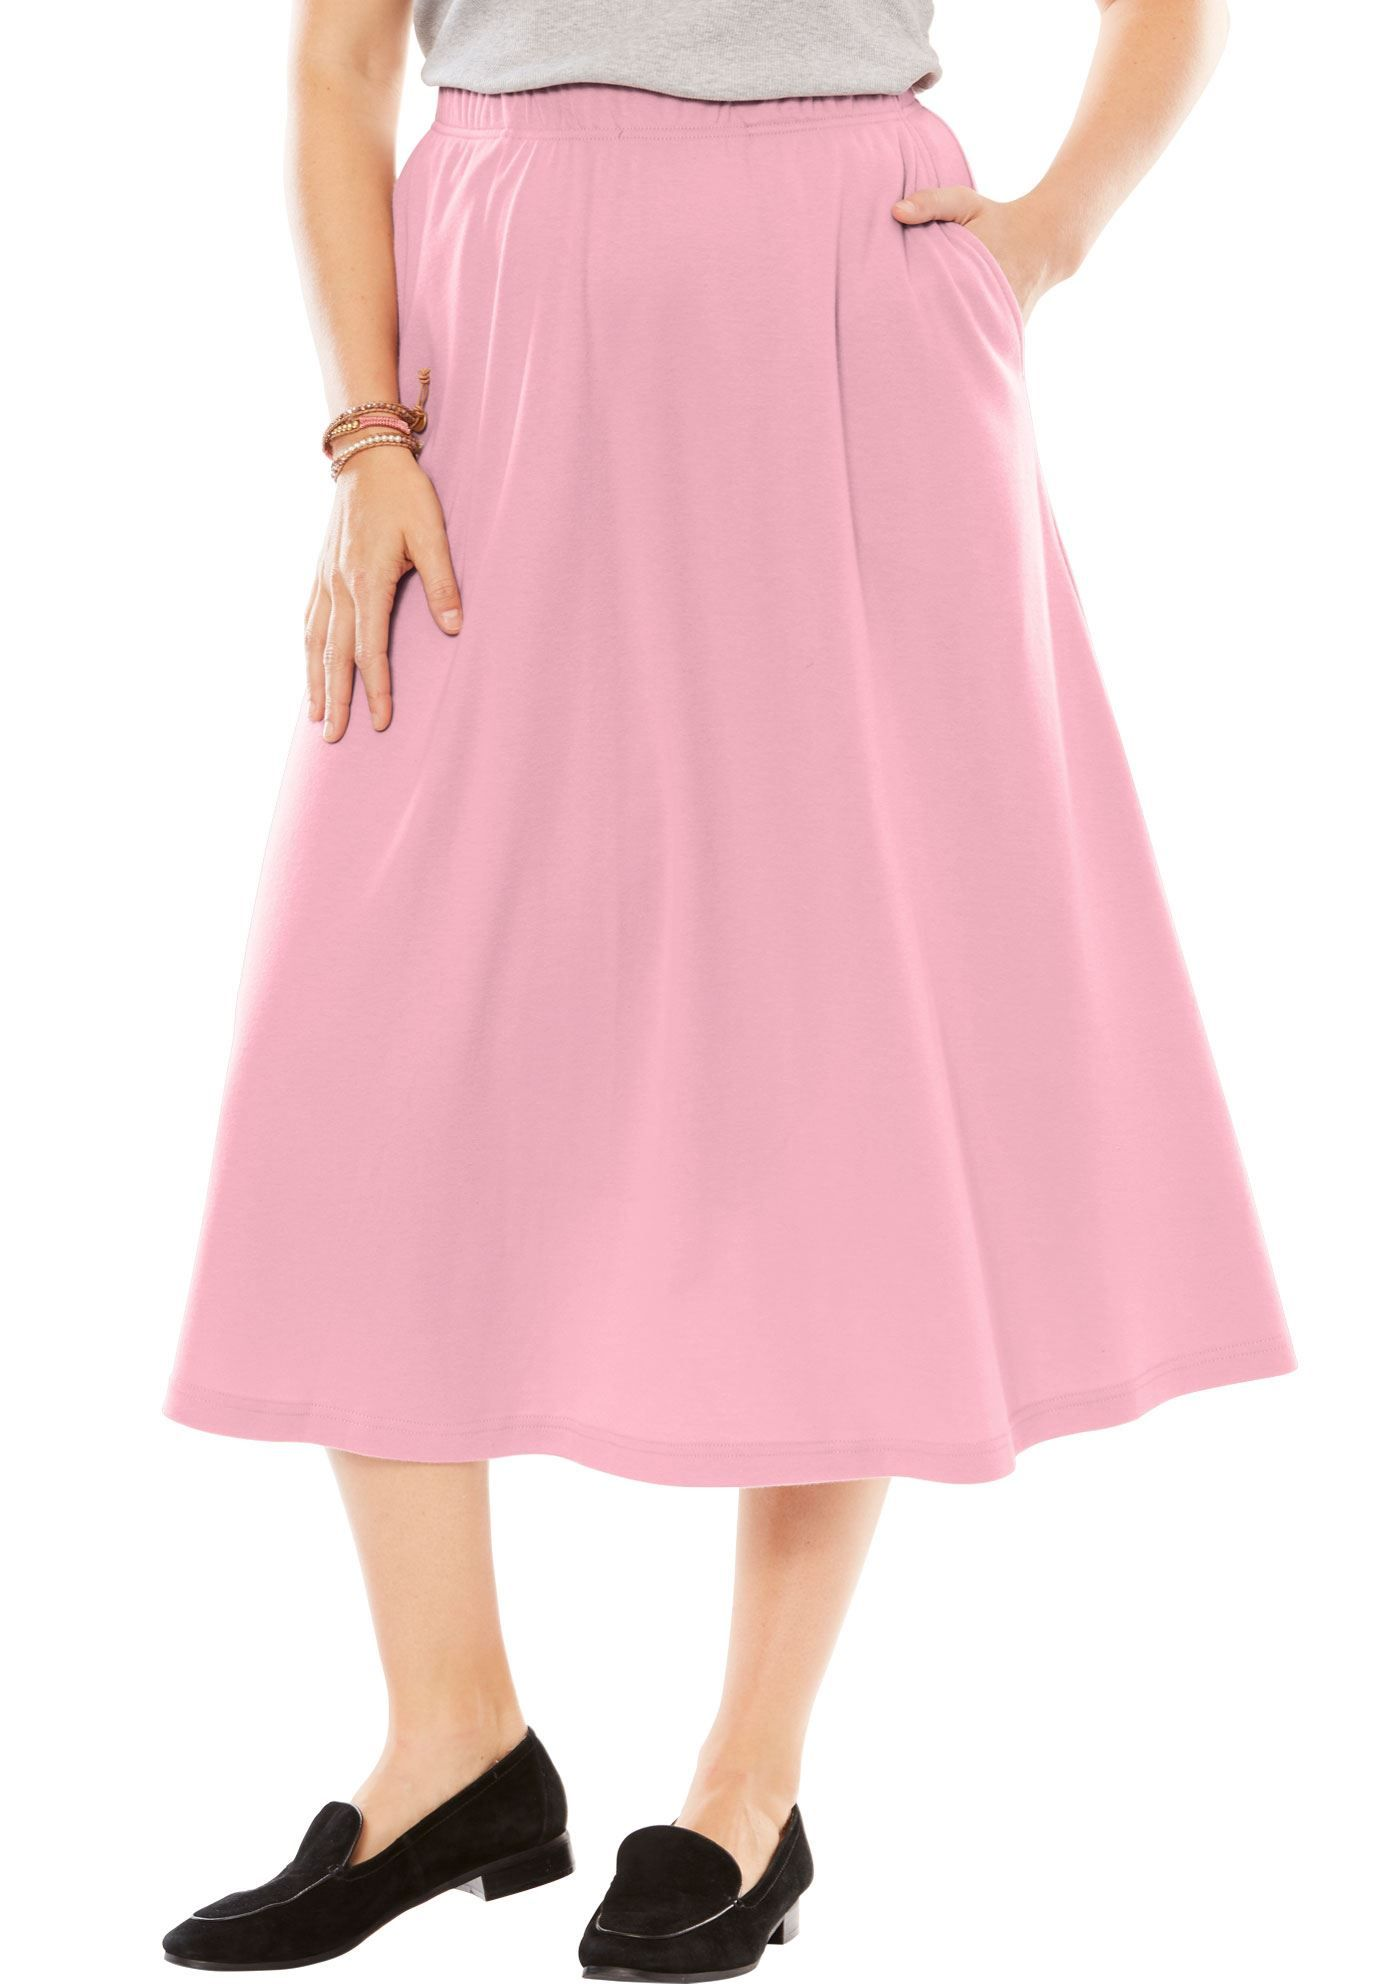 97e1658295 Petite 7-Day Knit A-line skirt - Women's Plus Size Clothing ...